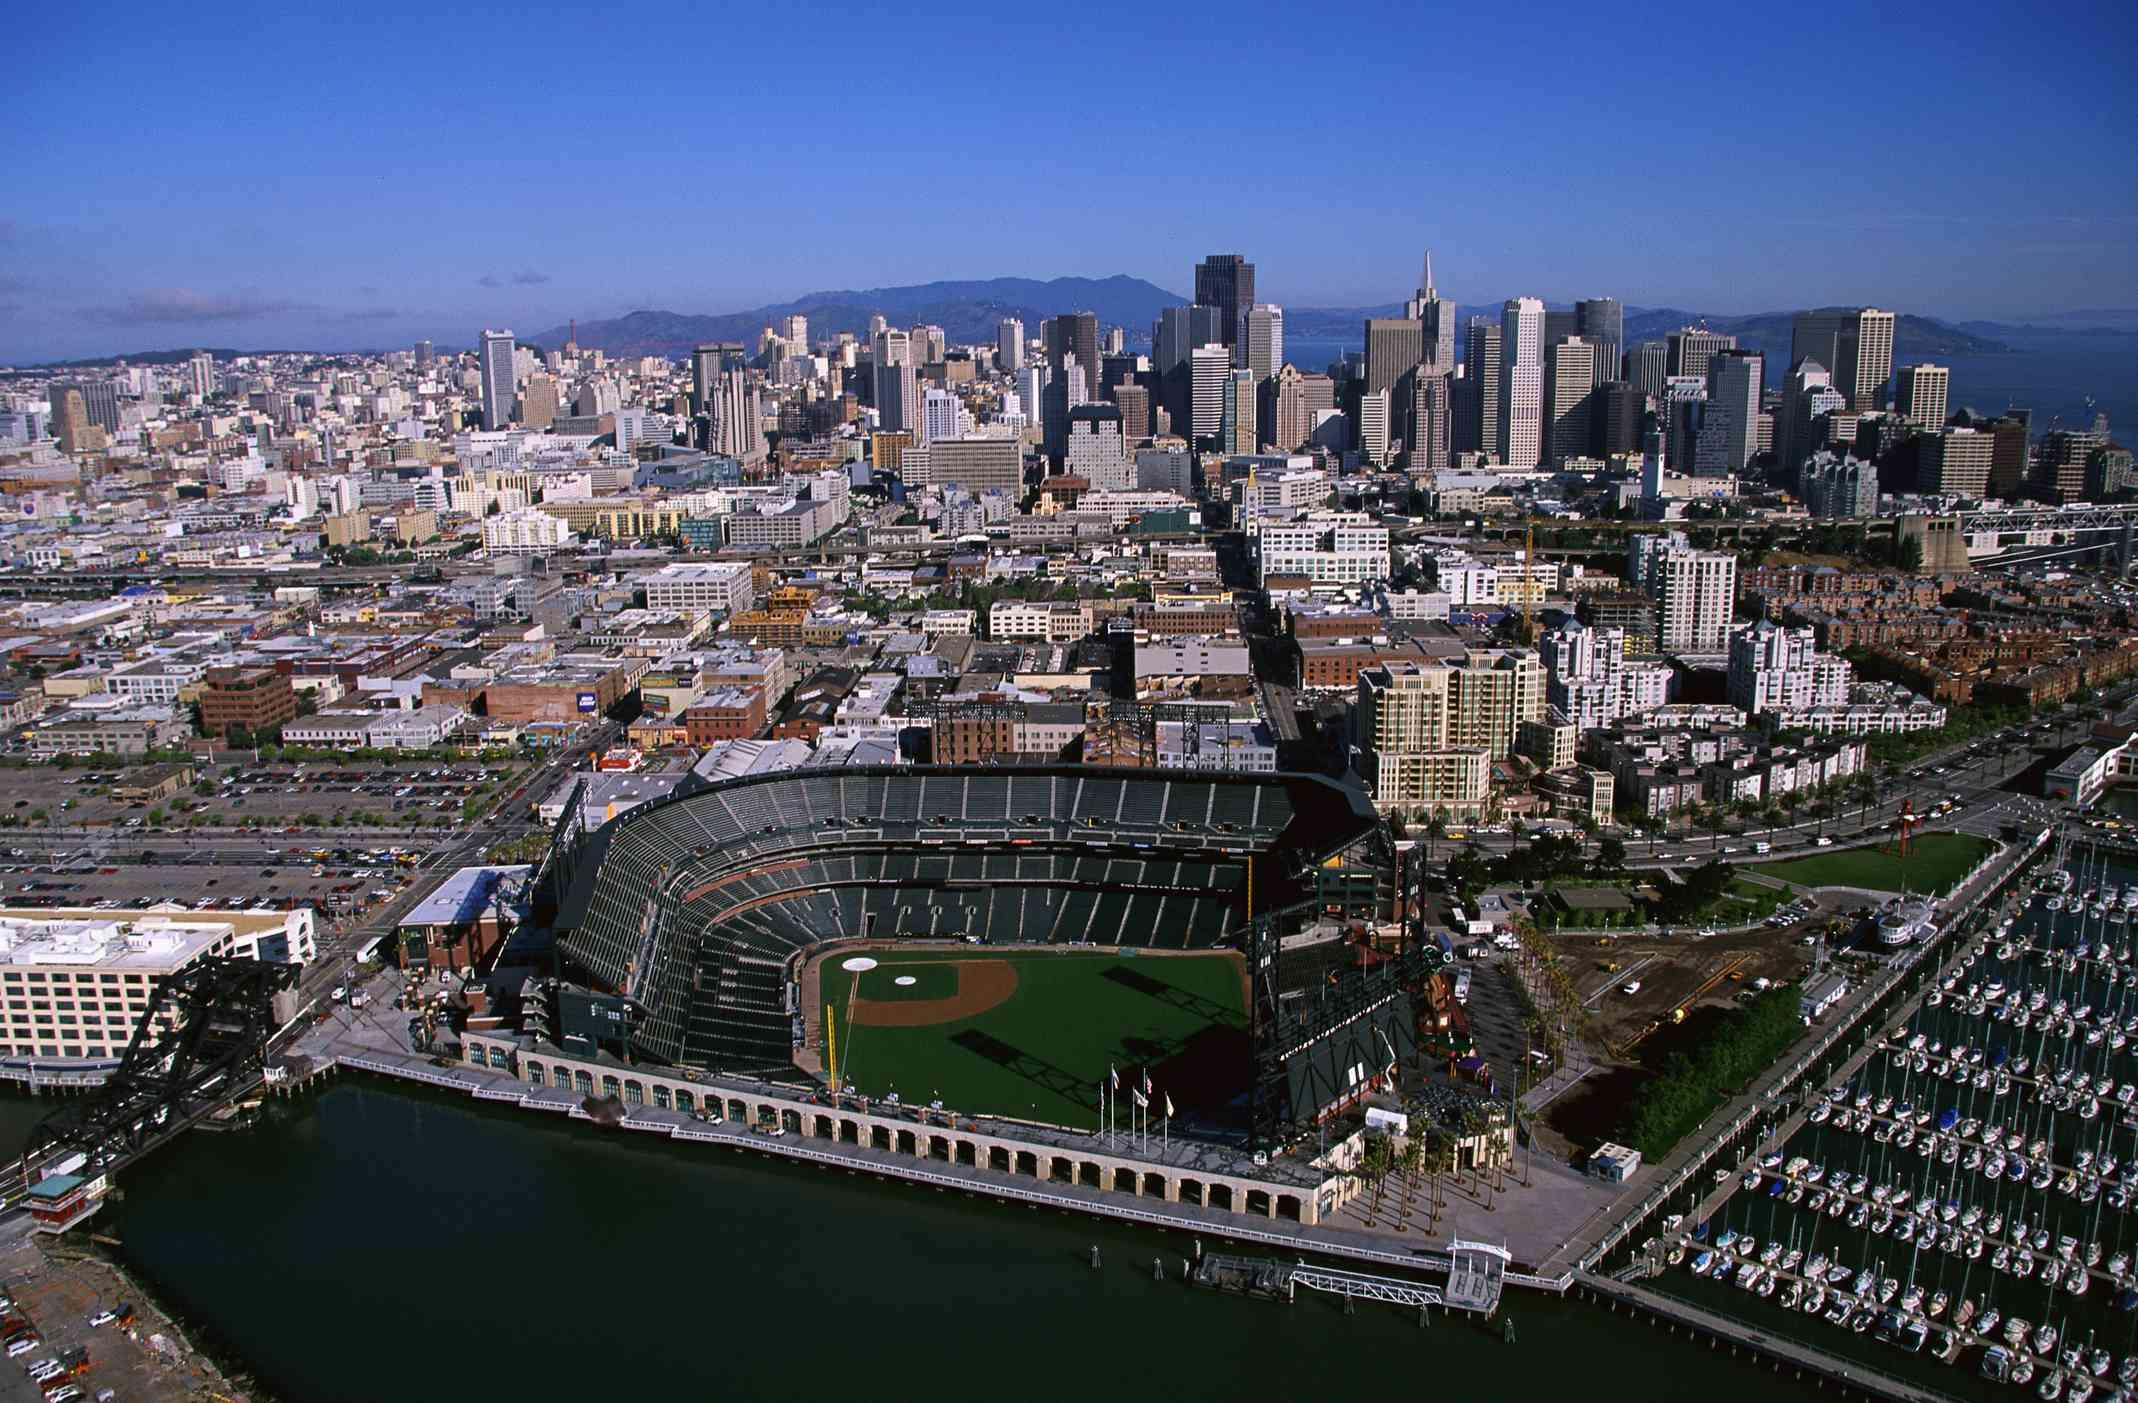 Giants Oracle Stadium in San Francisco